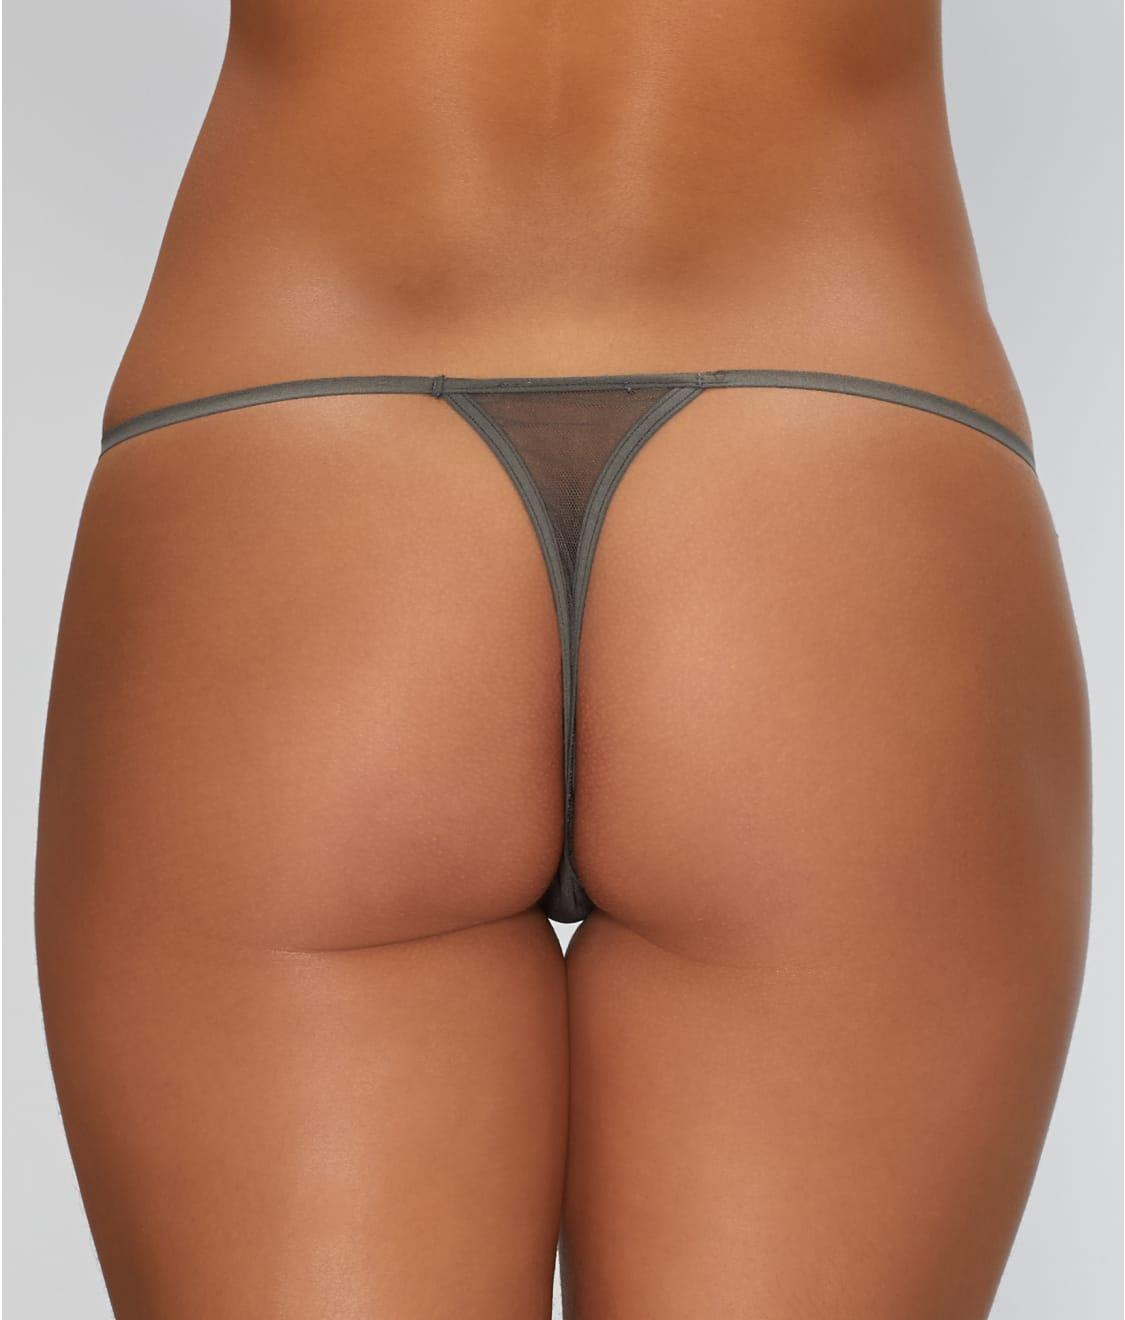 Cosabella soire peek-a-boo pantyhose